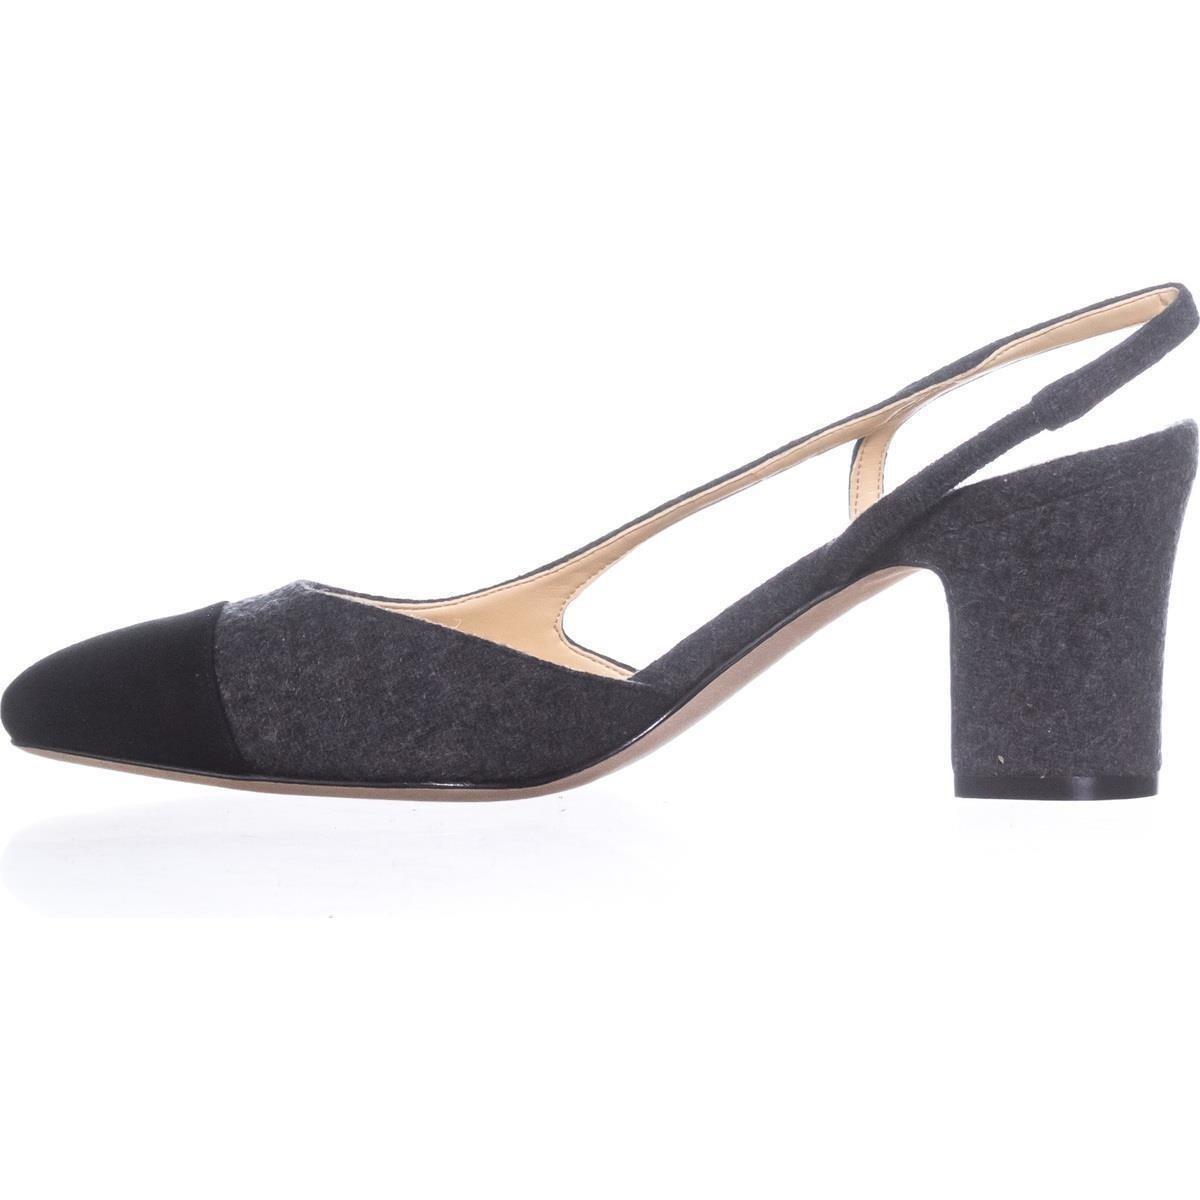 9b53cde493b Shop Ivanka Trump Liah Slingback D Orsay Heels